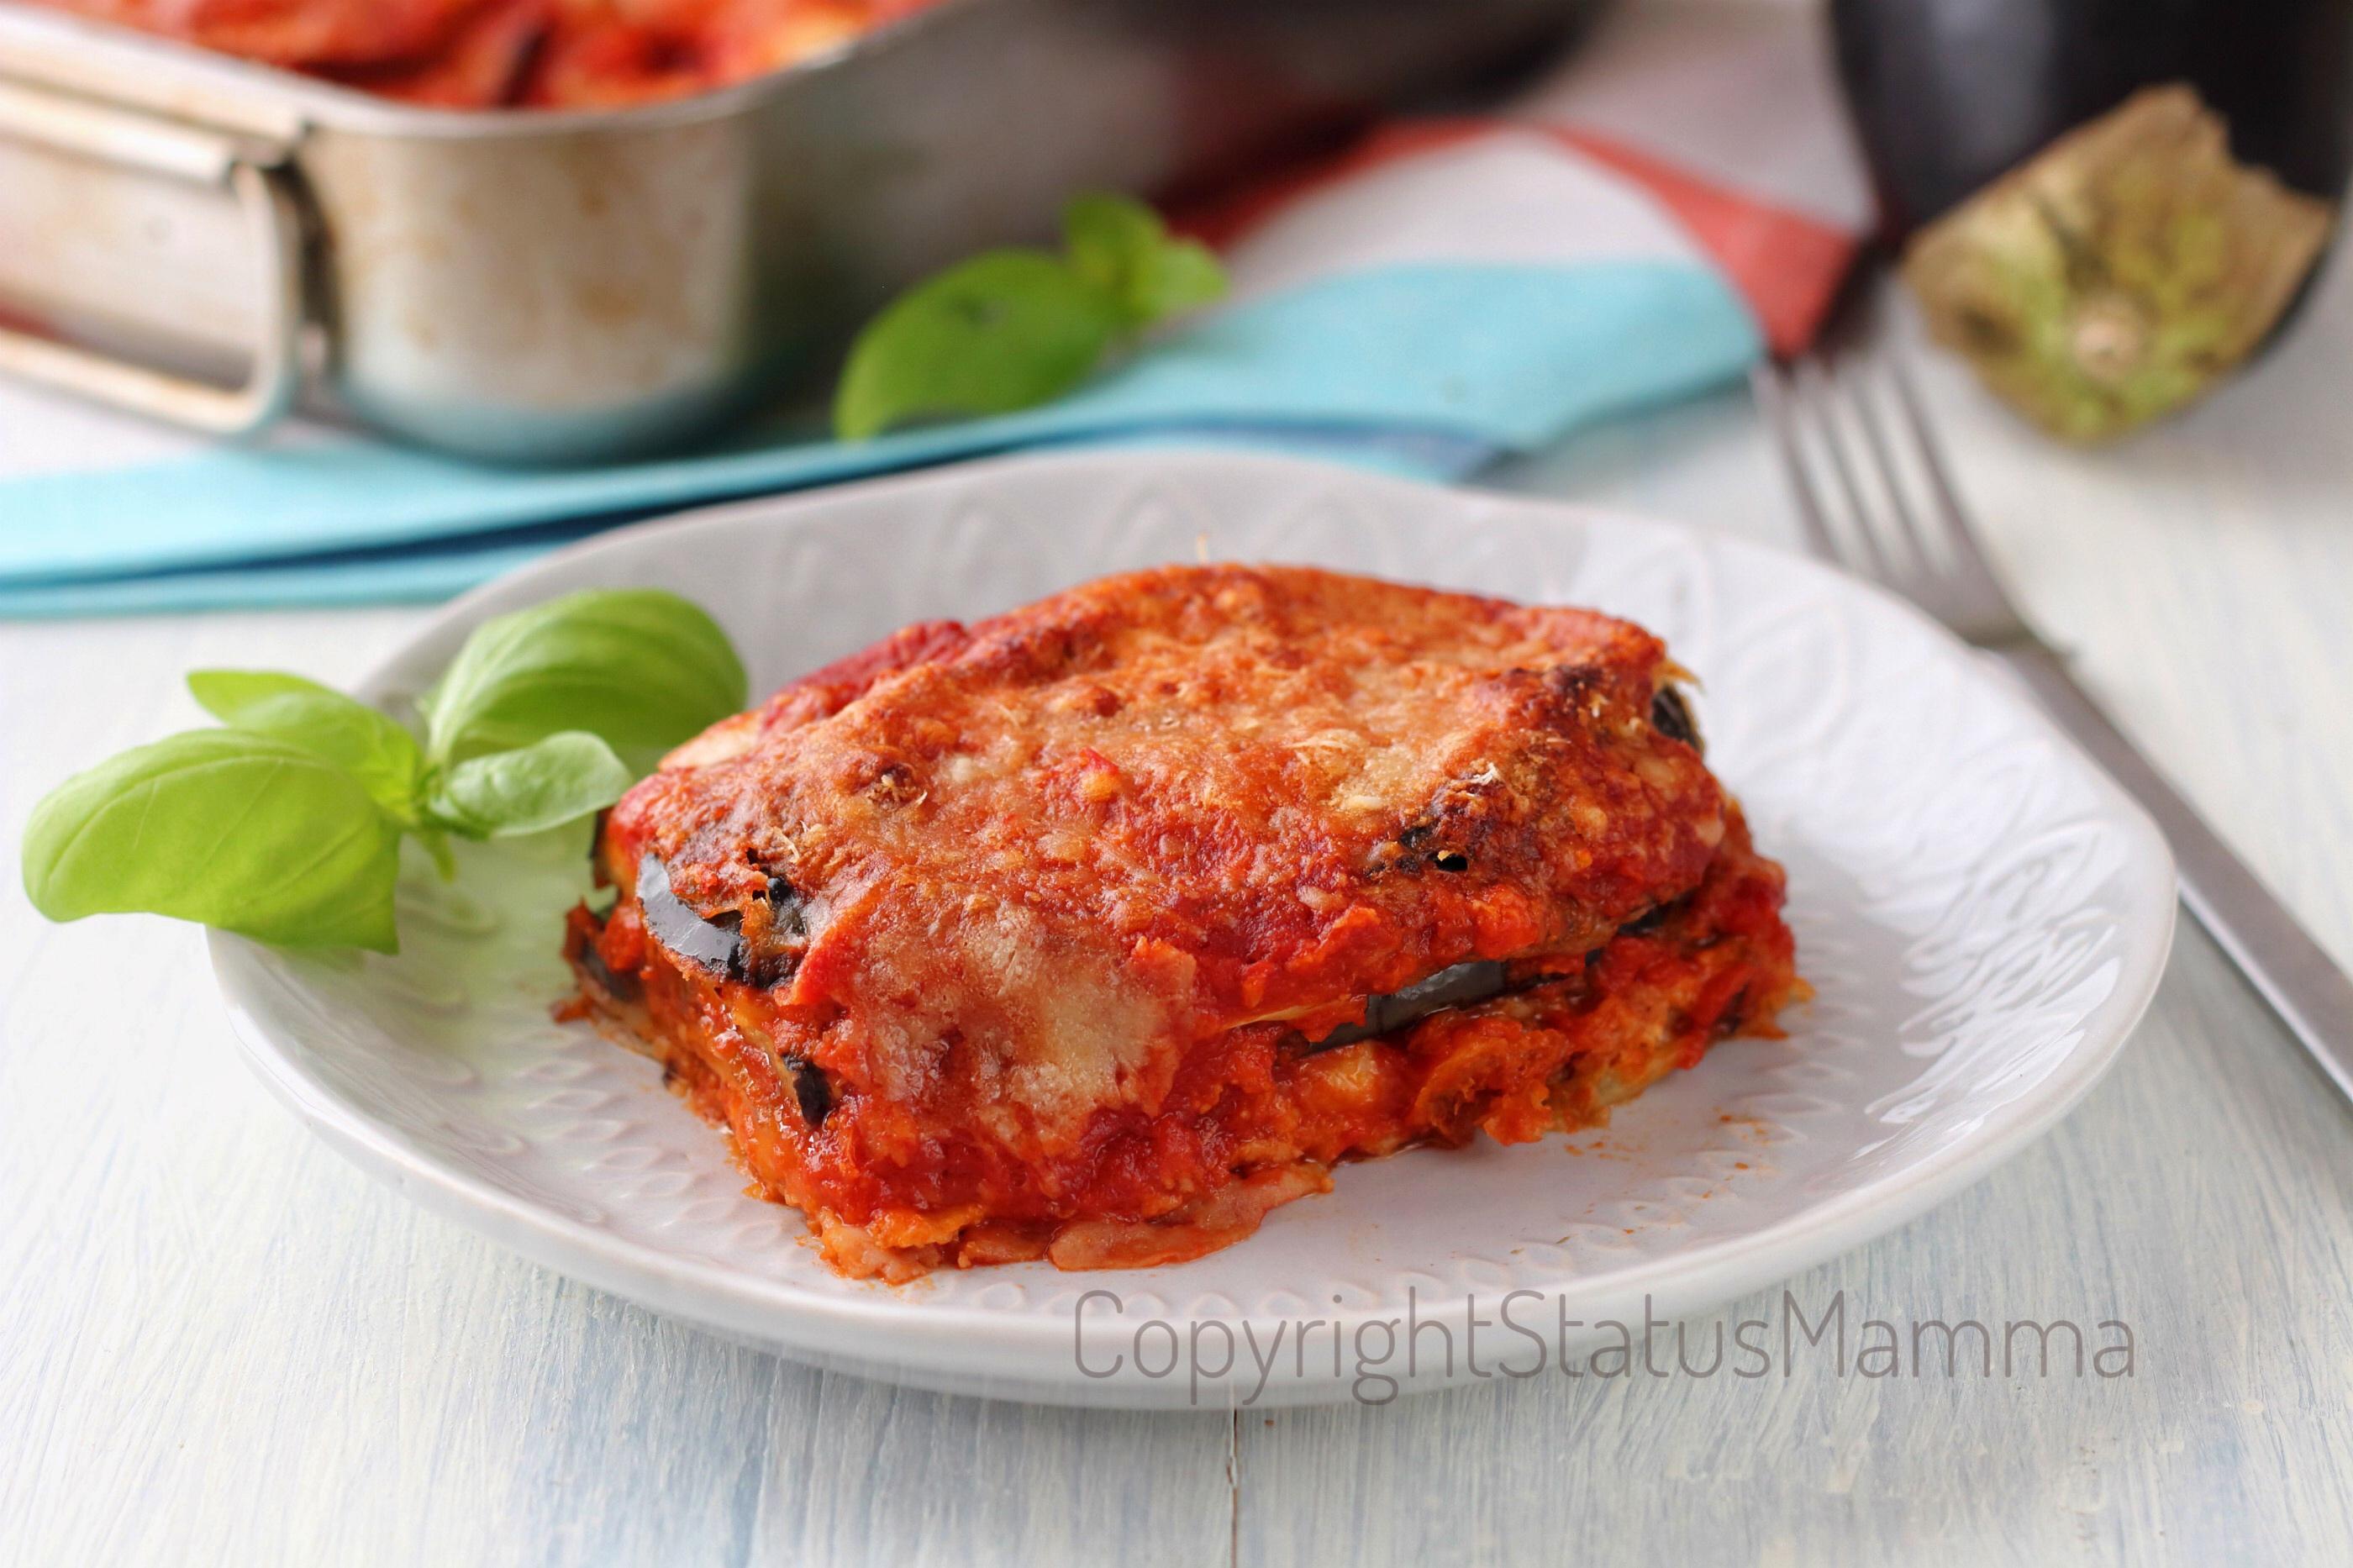 Parmigiana semplice di melanzane sugo mozzarella photo food photograpy ricetta vegetariana